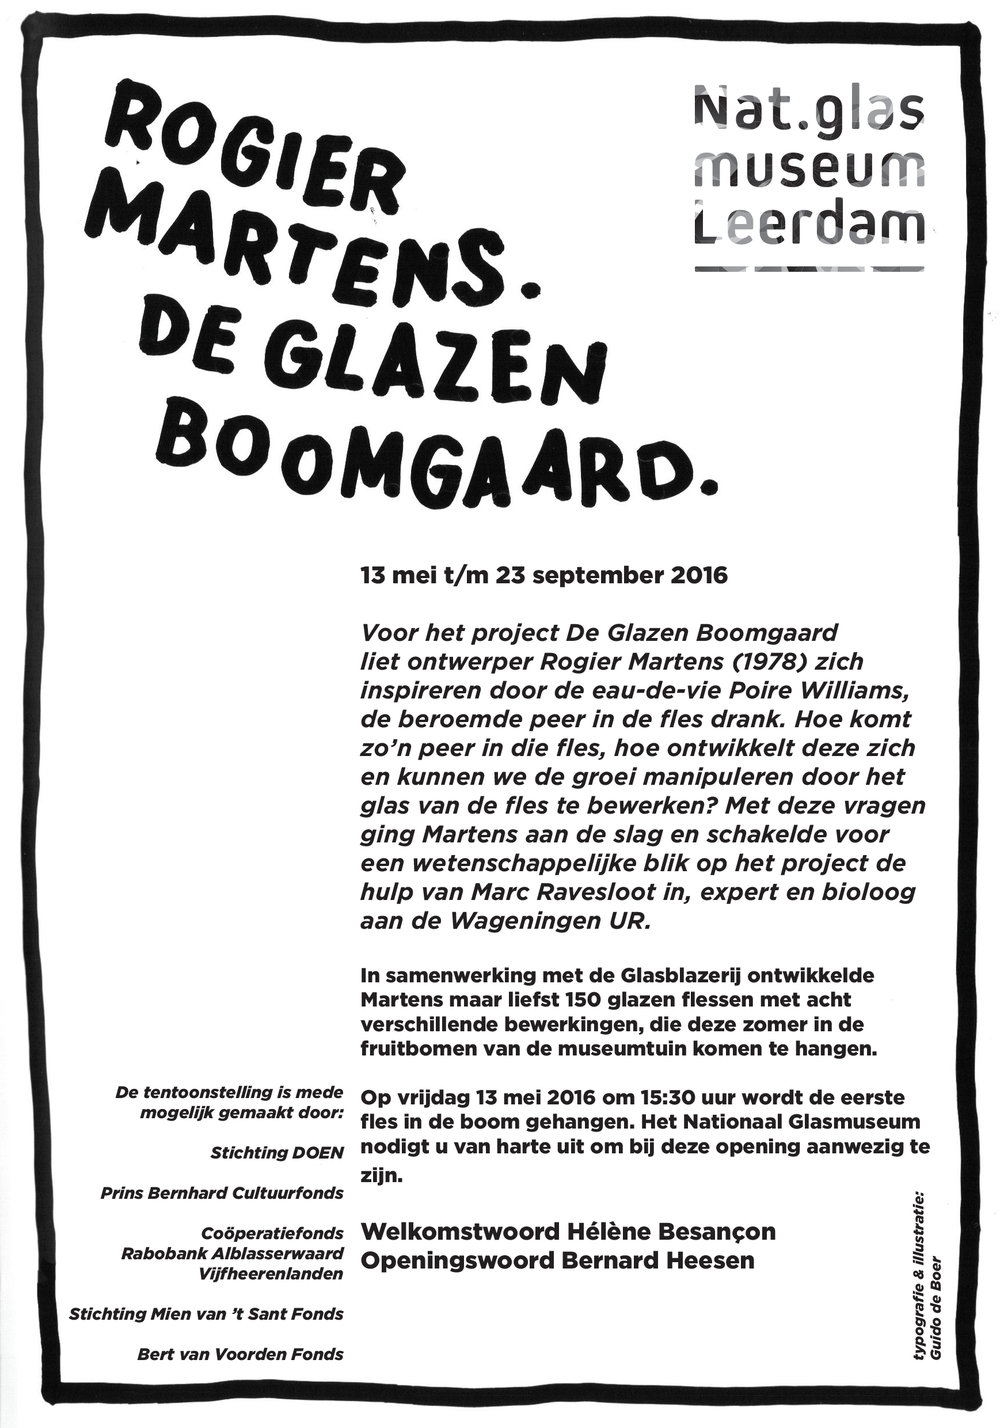 GLAZEN BOOMGAARD NATIONAAL GLASMUSEUM ROGIER MARTENS affiche achterkant.jpg